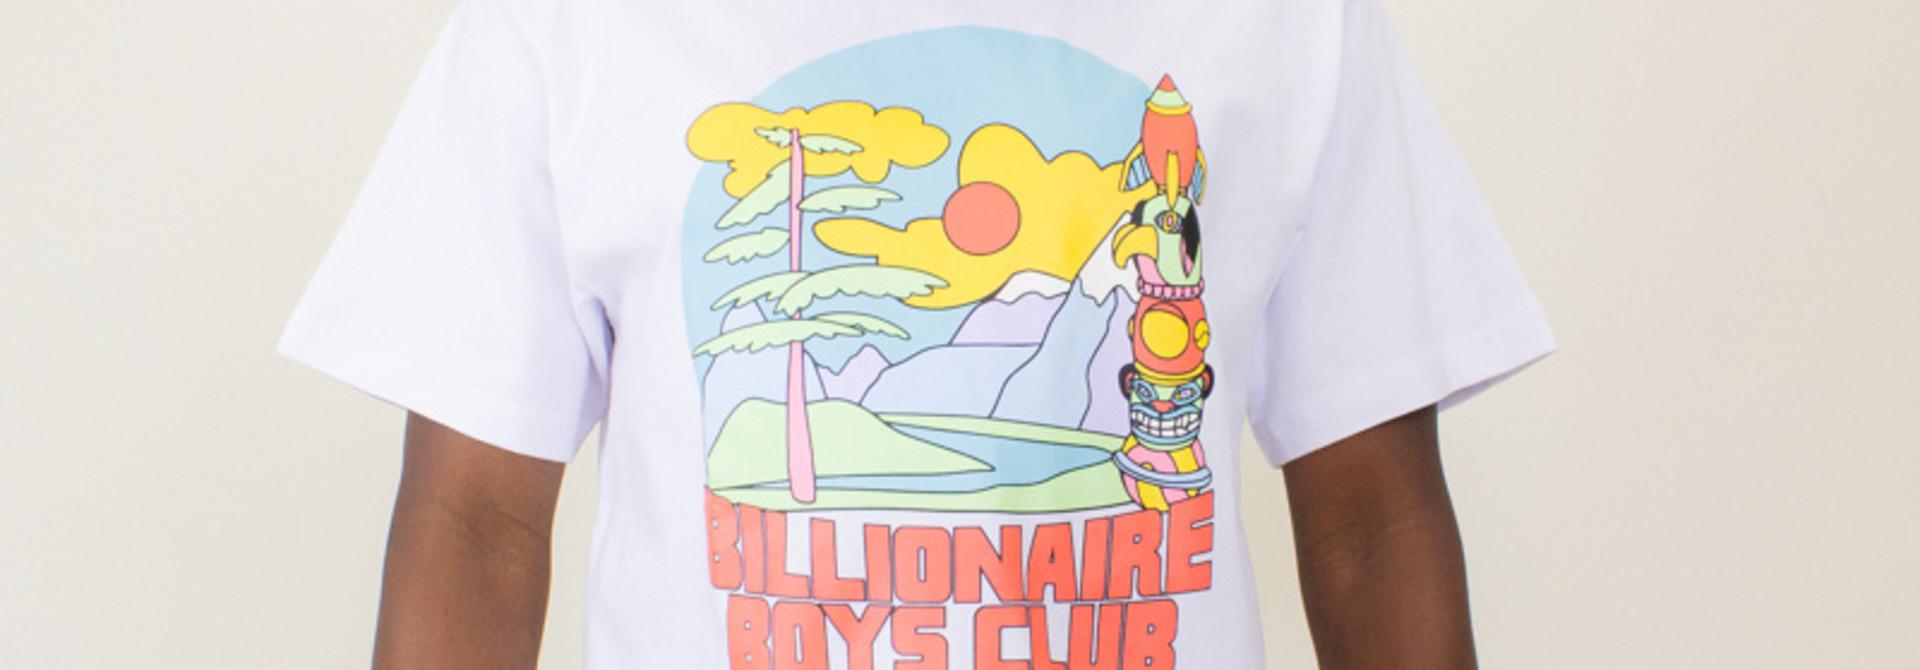 Billionaire Boys Club Great Scene Tee - White